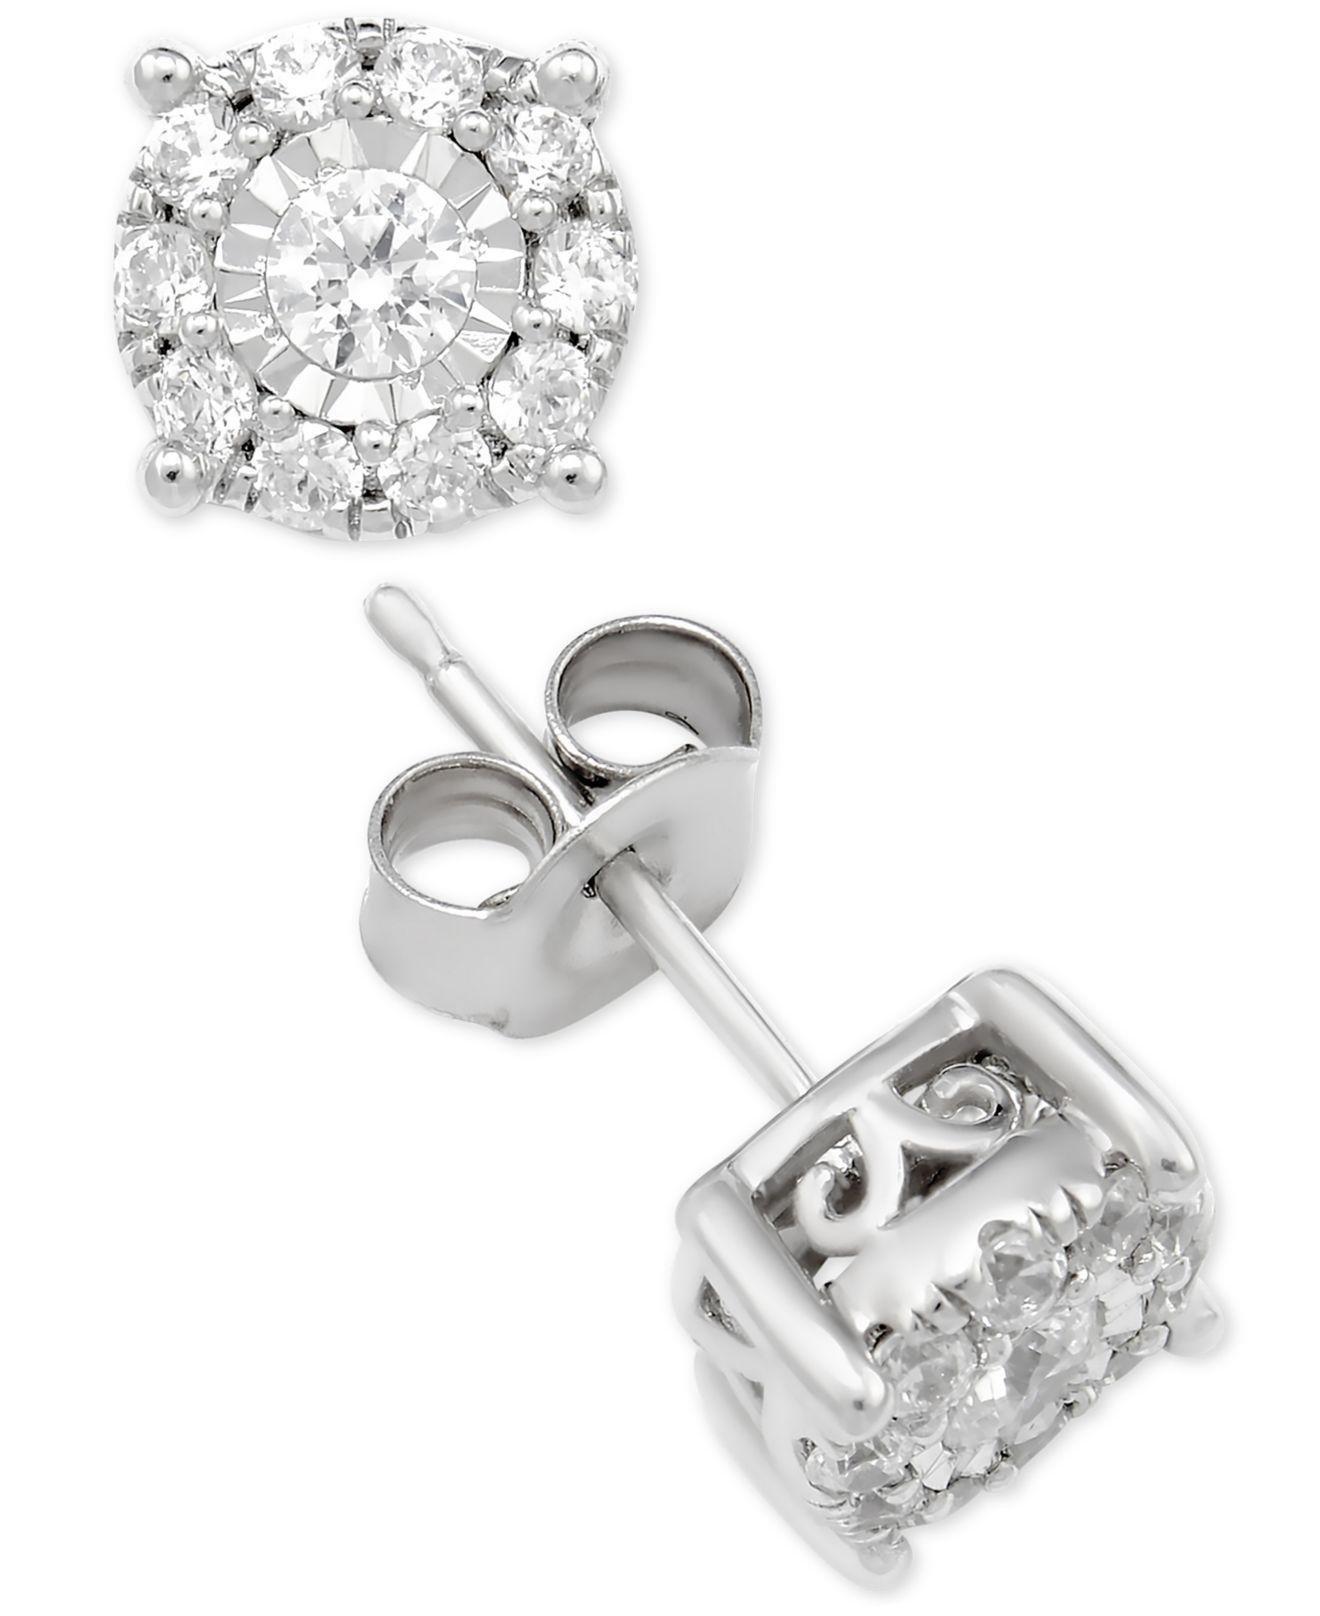 lyst macy 39 s diamond halo stud earrings 1 ct t w in. Black Bedroom Furniture Sets. Home Design Ideas